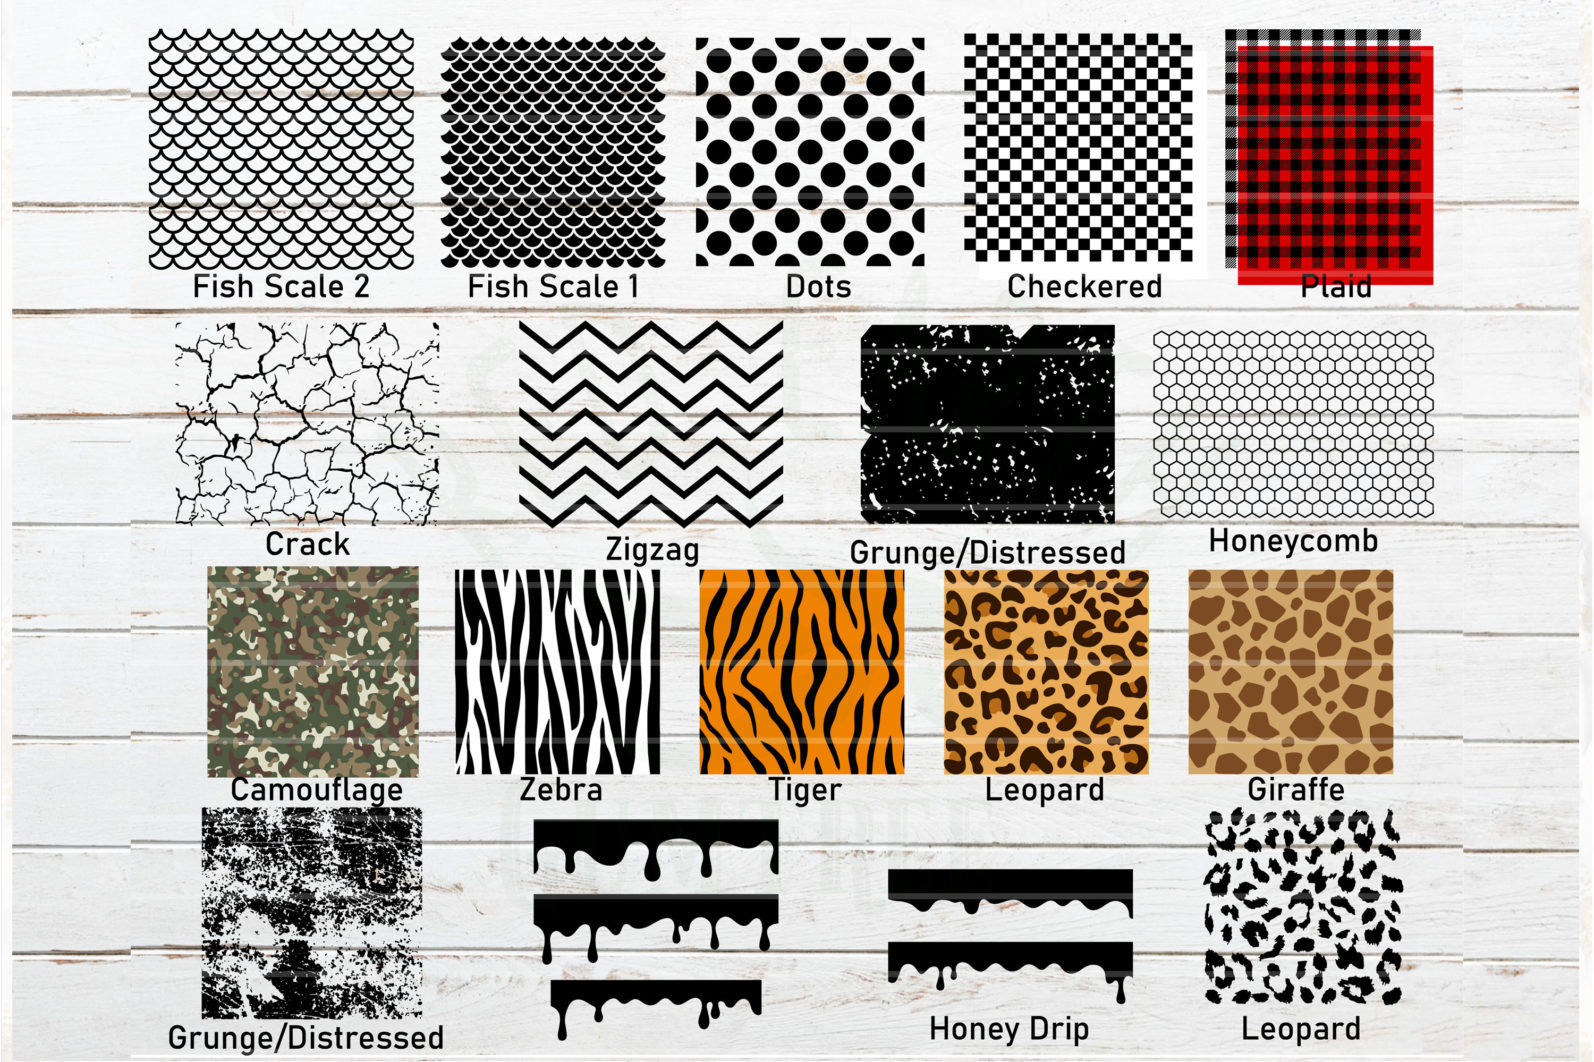 The Mega SVG Bundle Design. More than 650 Designs included in SVG,PNG,DXF,PDF,EPS formats - patterns template svg stencil template bundle svg plaid template svg mermaid fish scale svg grunge svgdistressed pattern svgleopard pattern svg tiger pattern svg 2 scaled -